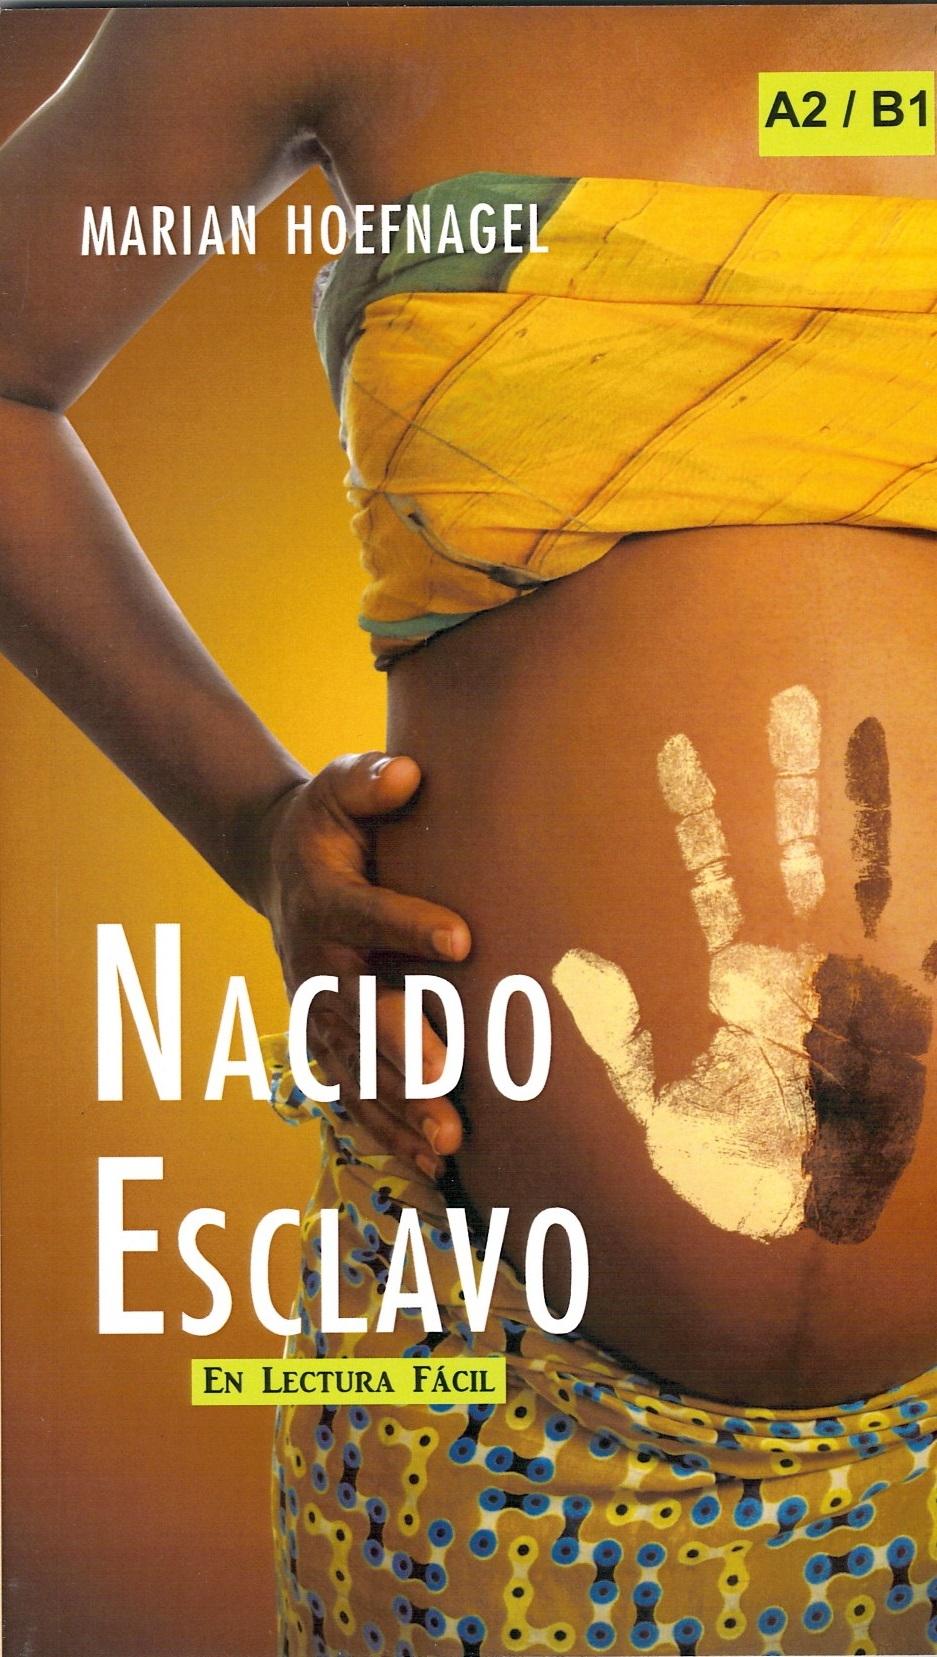 Lectura fácil Nacido esclavo